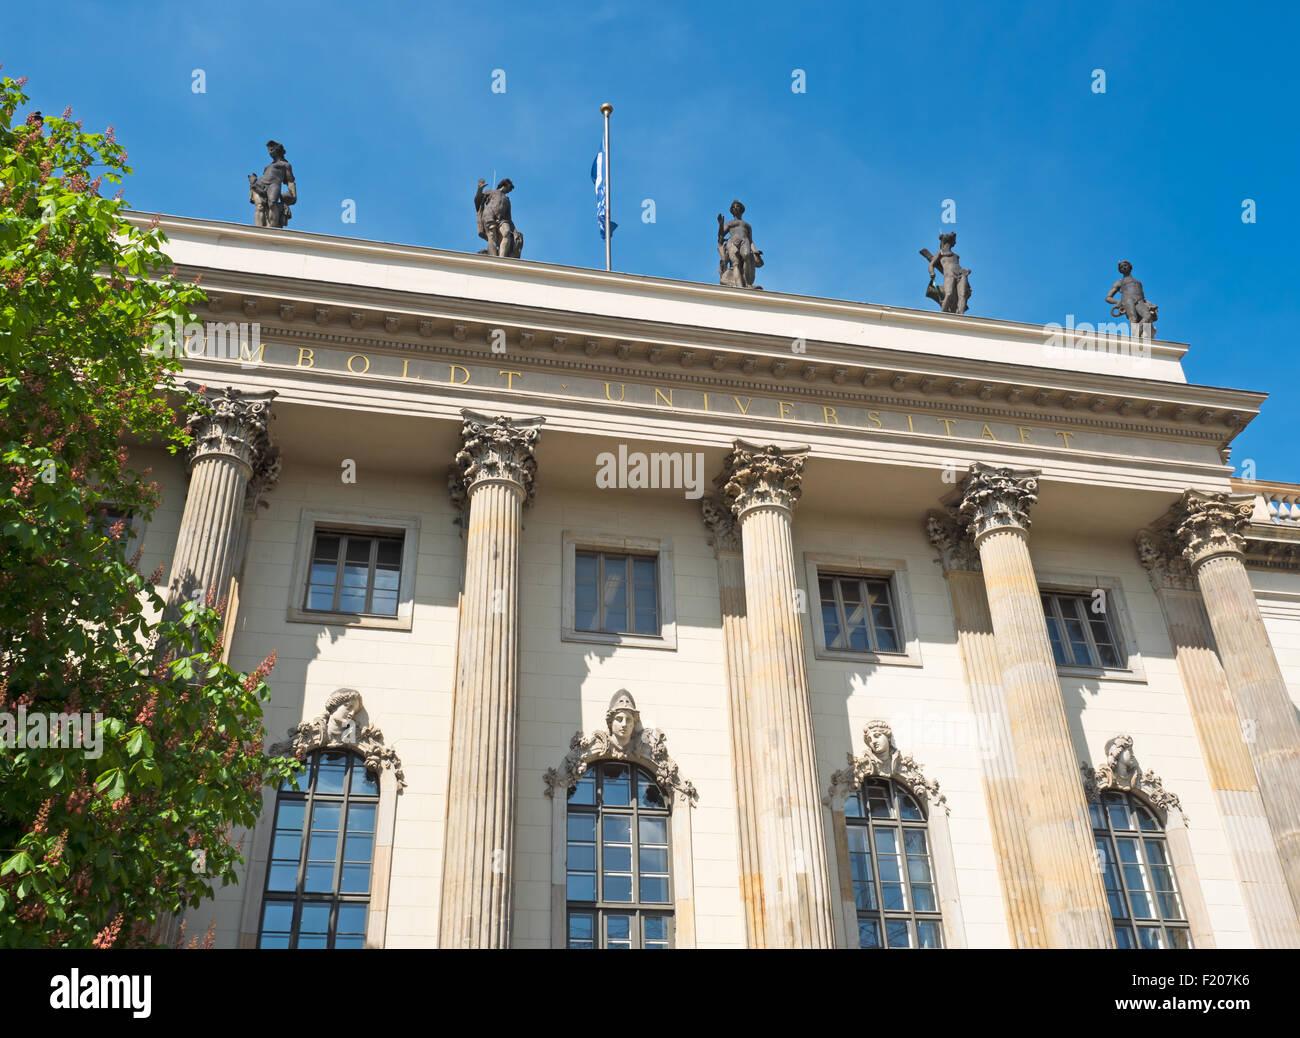 Humboldt Universität Berlin - Stock Image